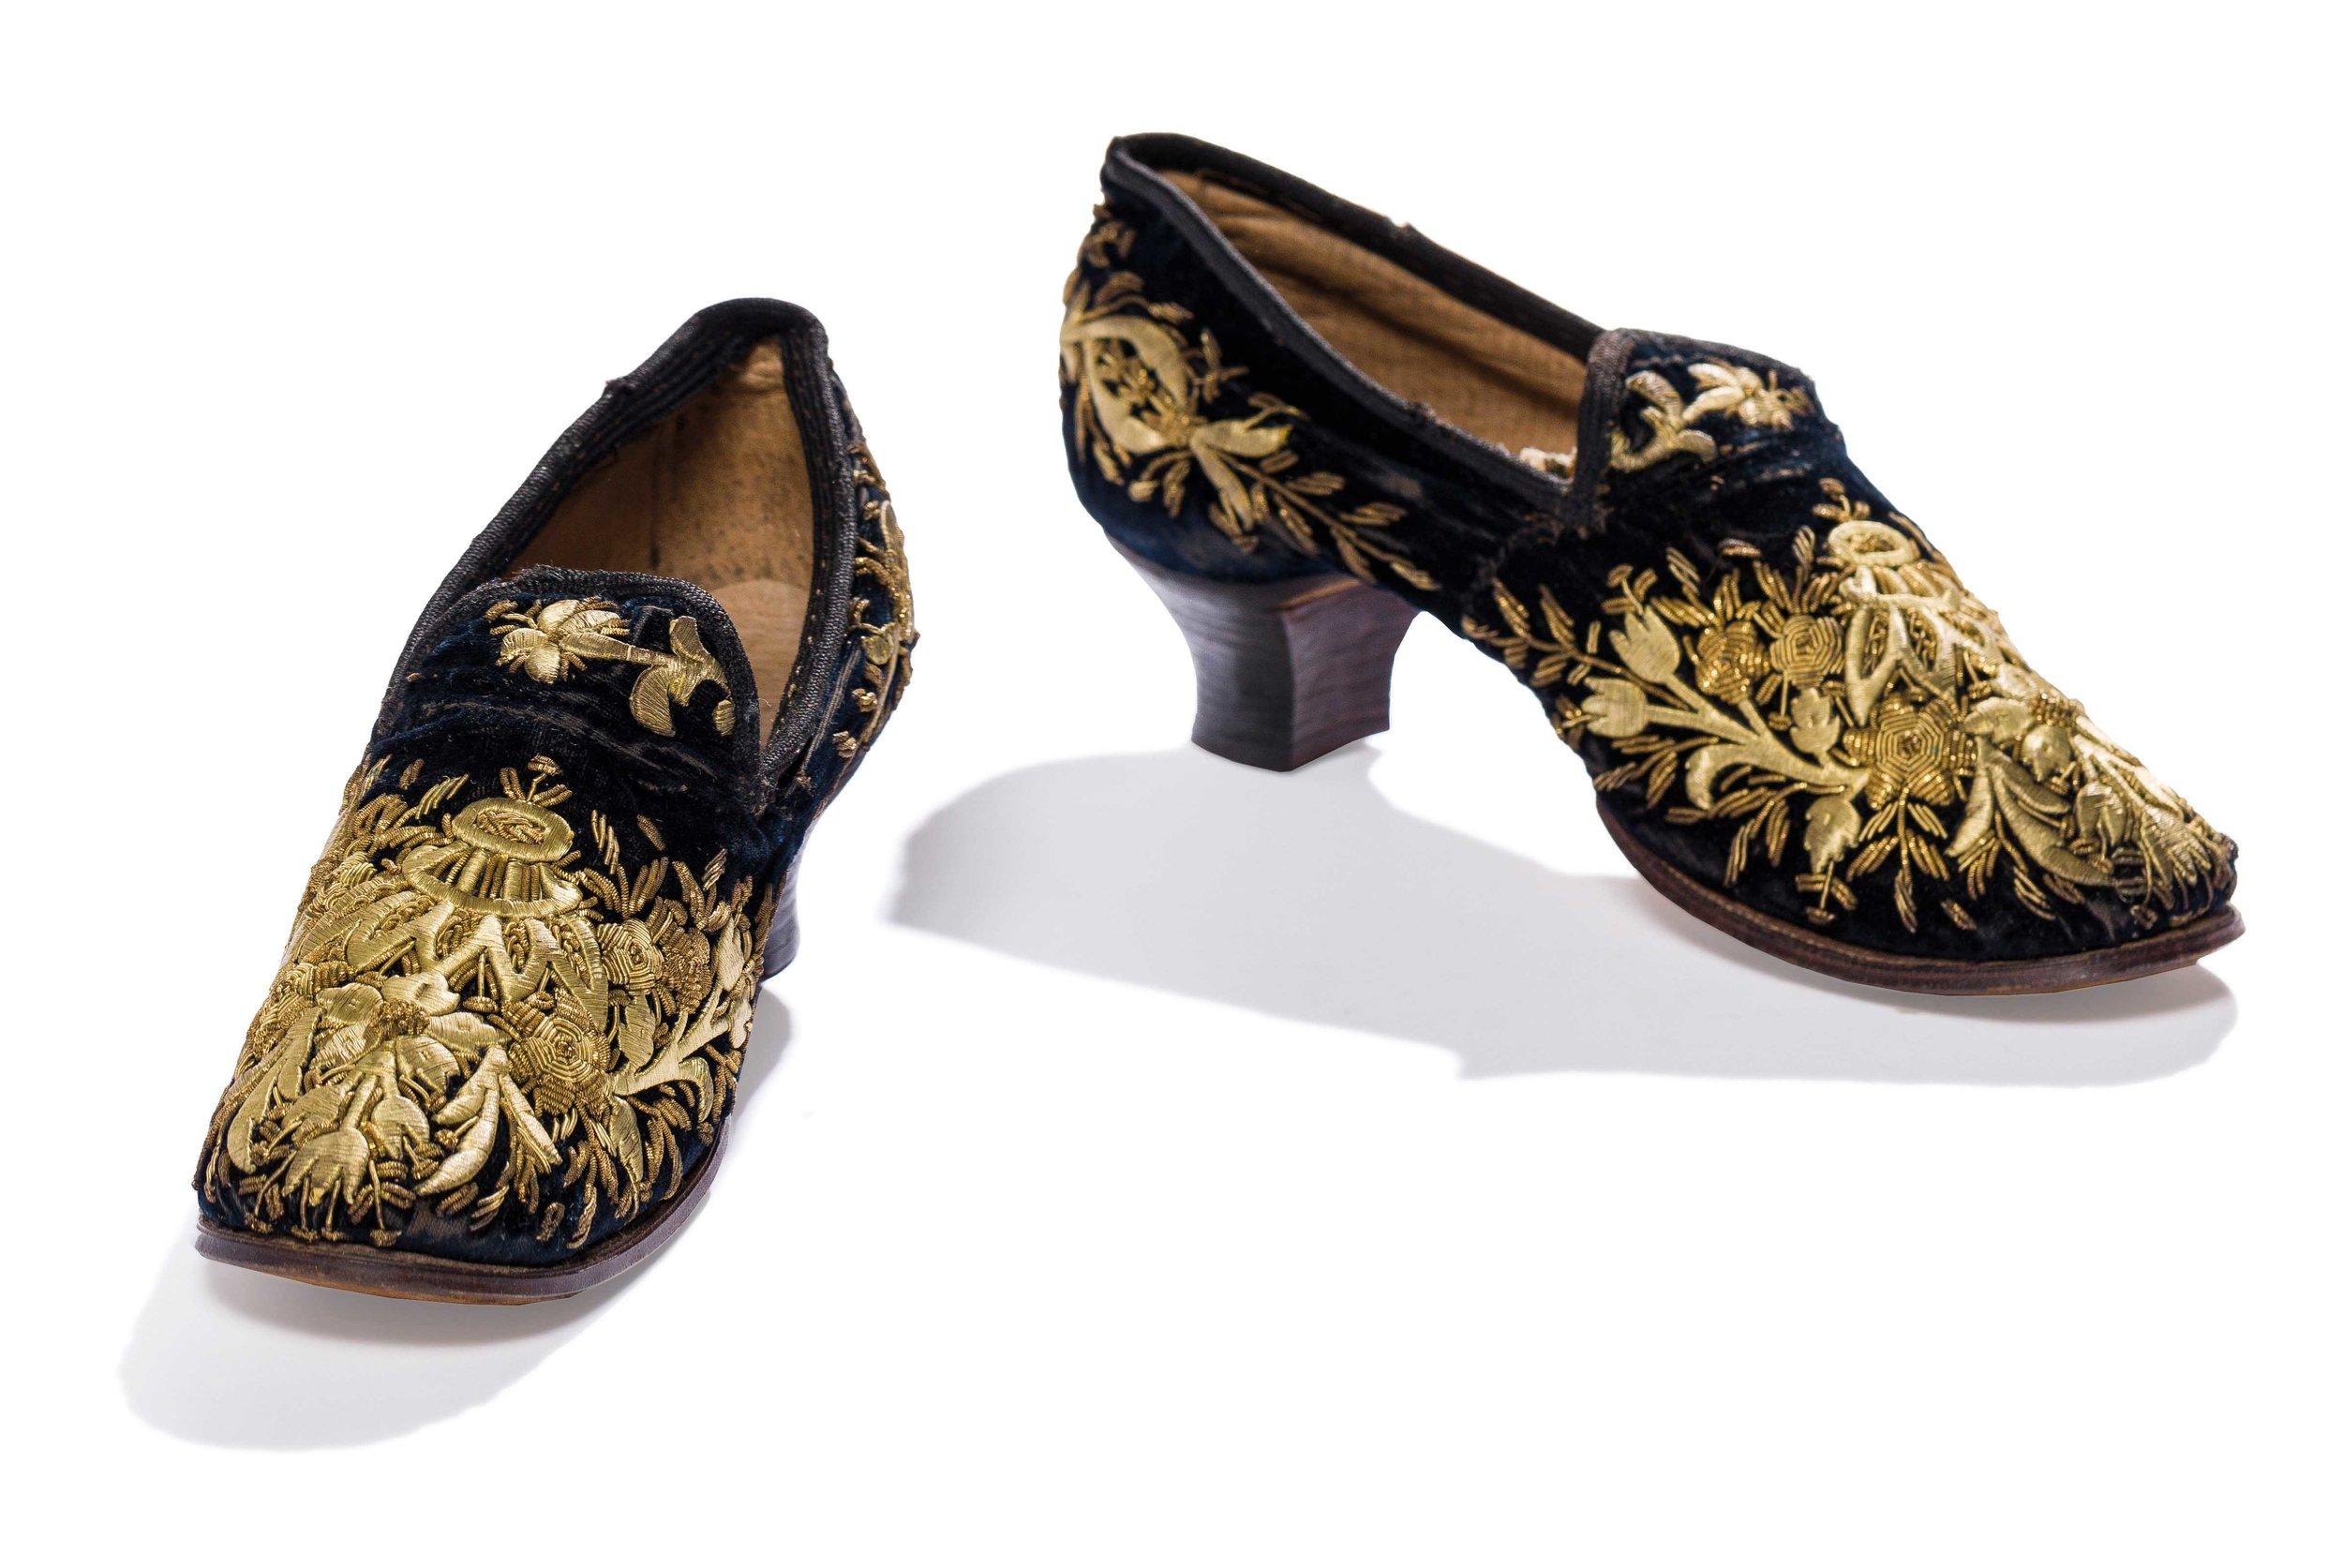 Antique Ottoman Pair Of Shoes